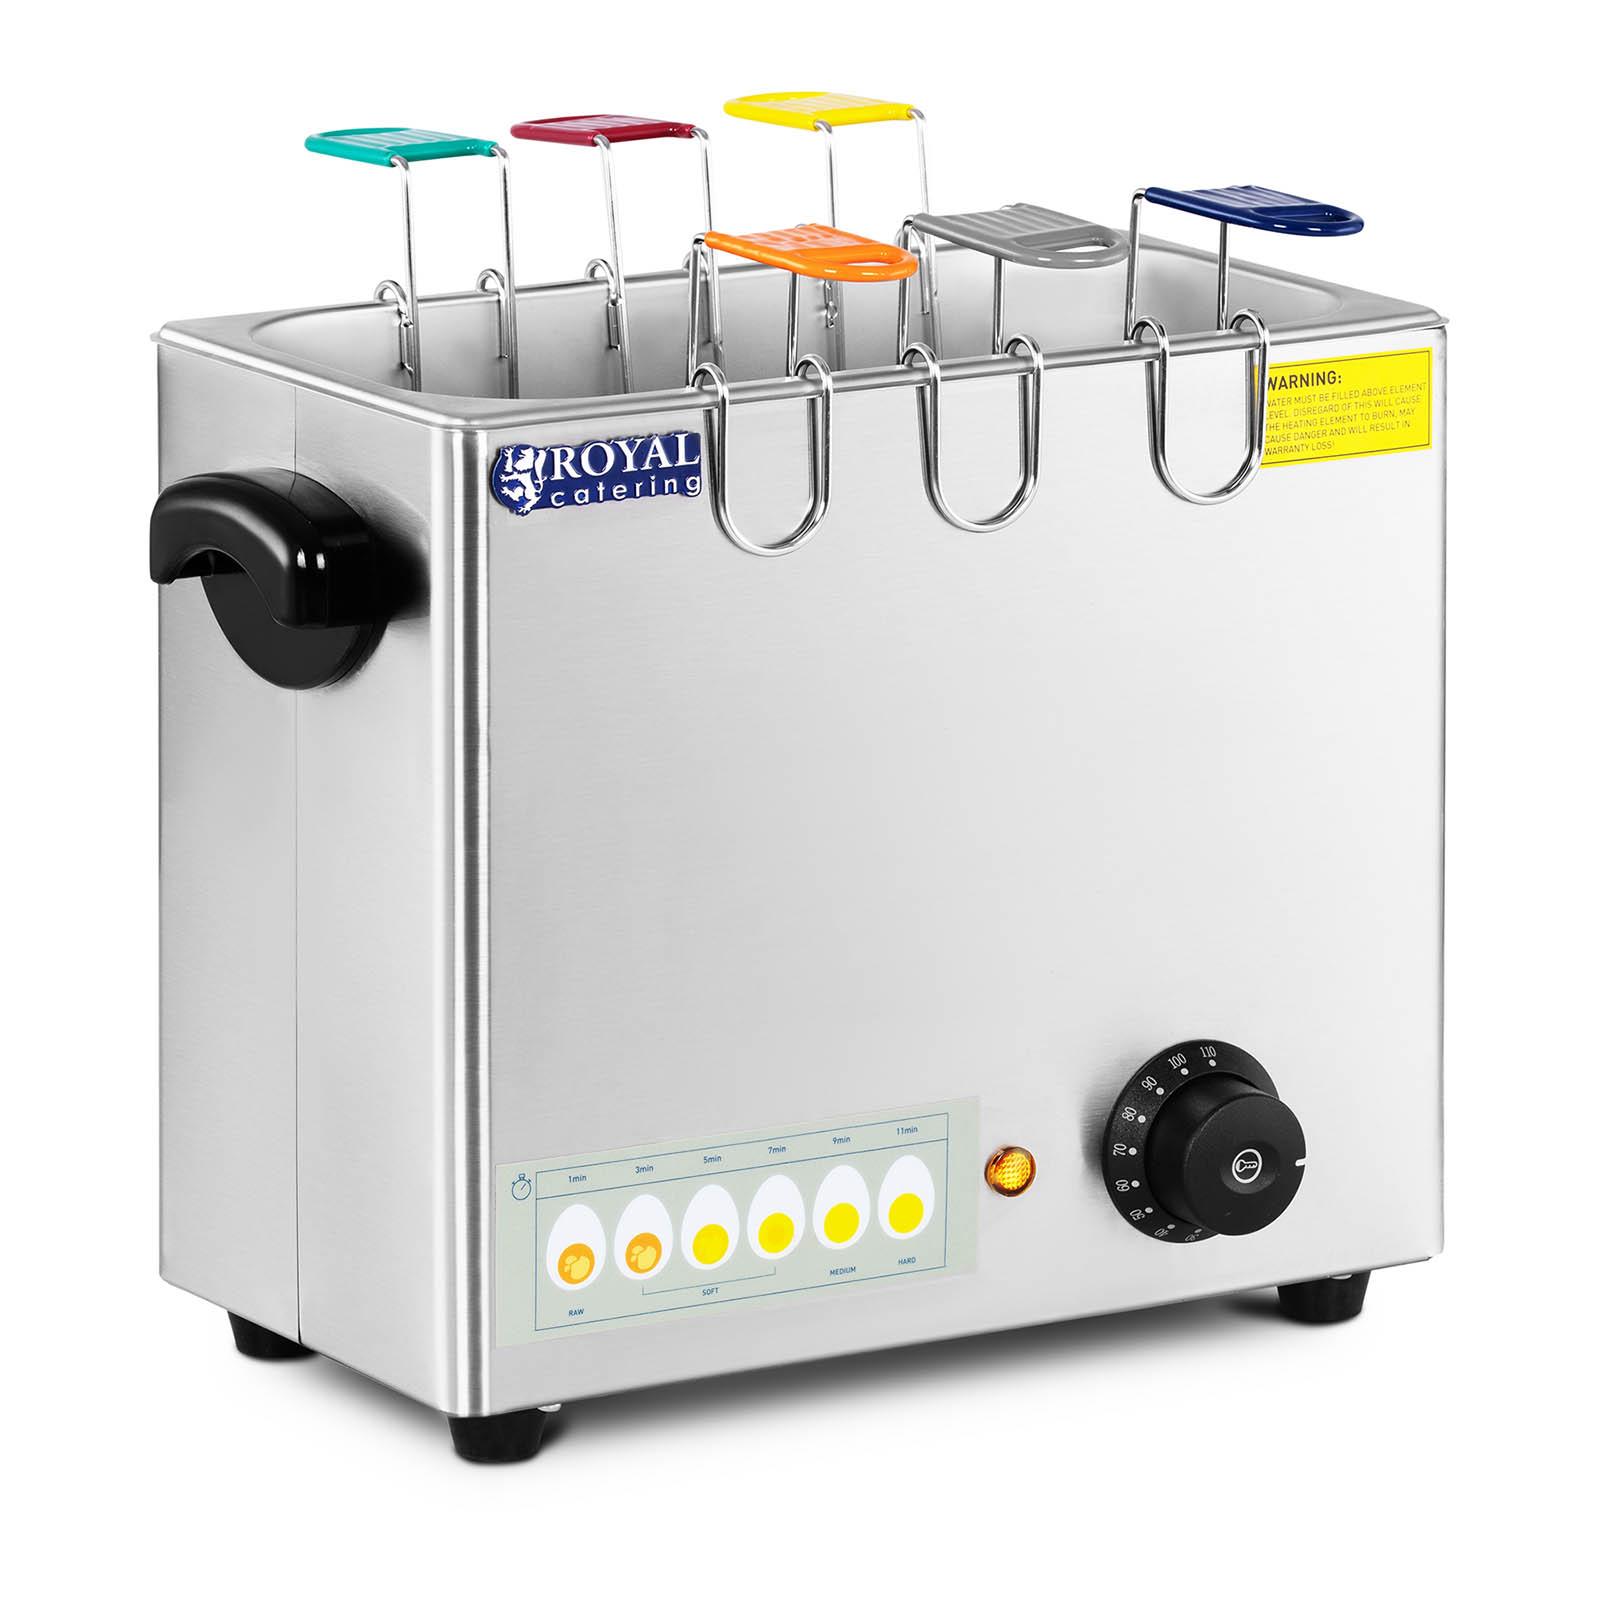 Gastro Eierkocher Elektrisch 6 Eier 2600 W 230 V 30-110 °C Edelstahl Profi Neu